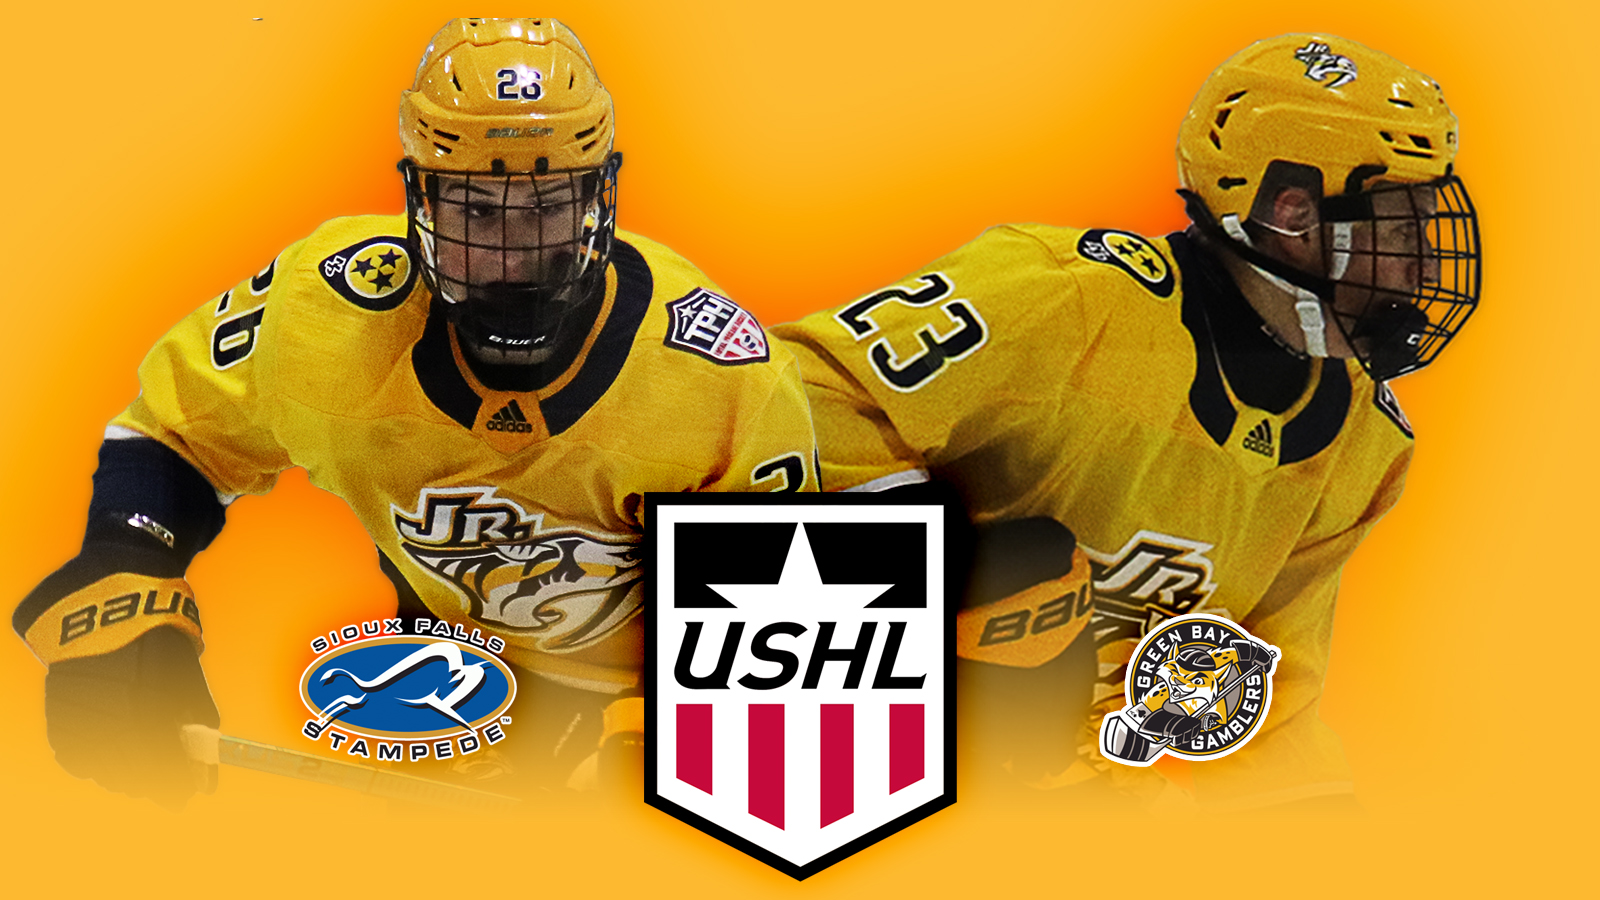 USHL Draft NJP